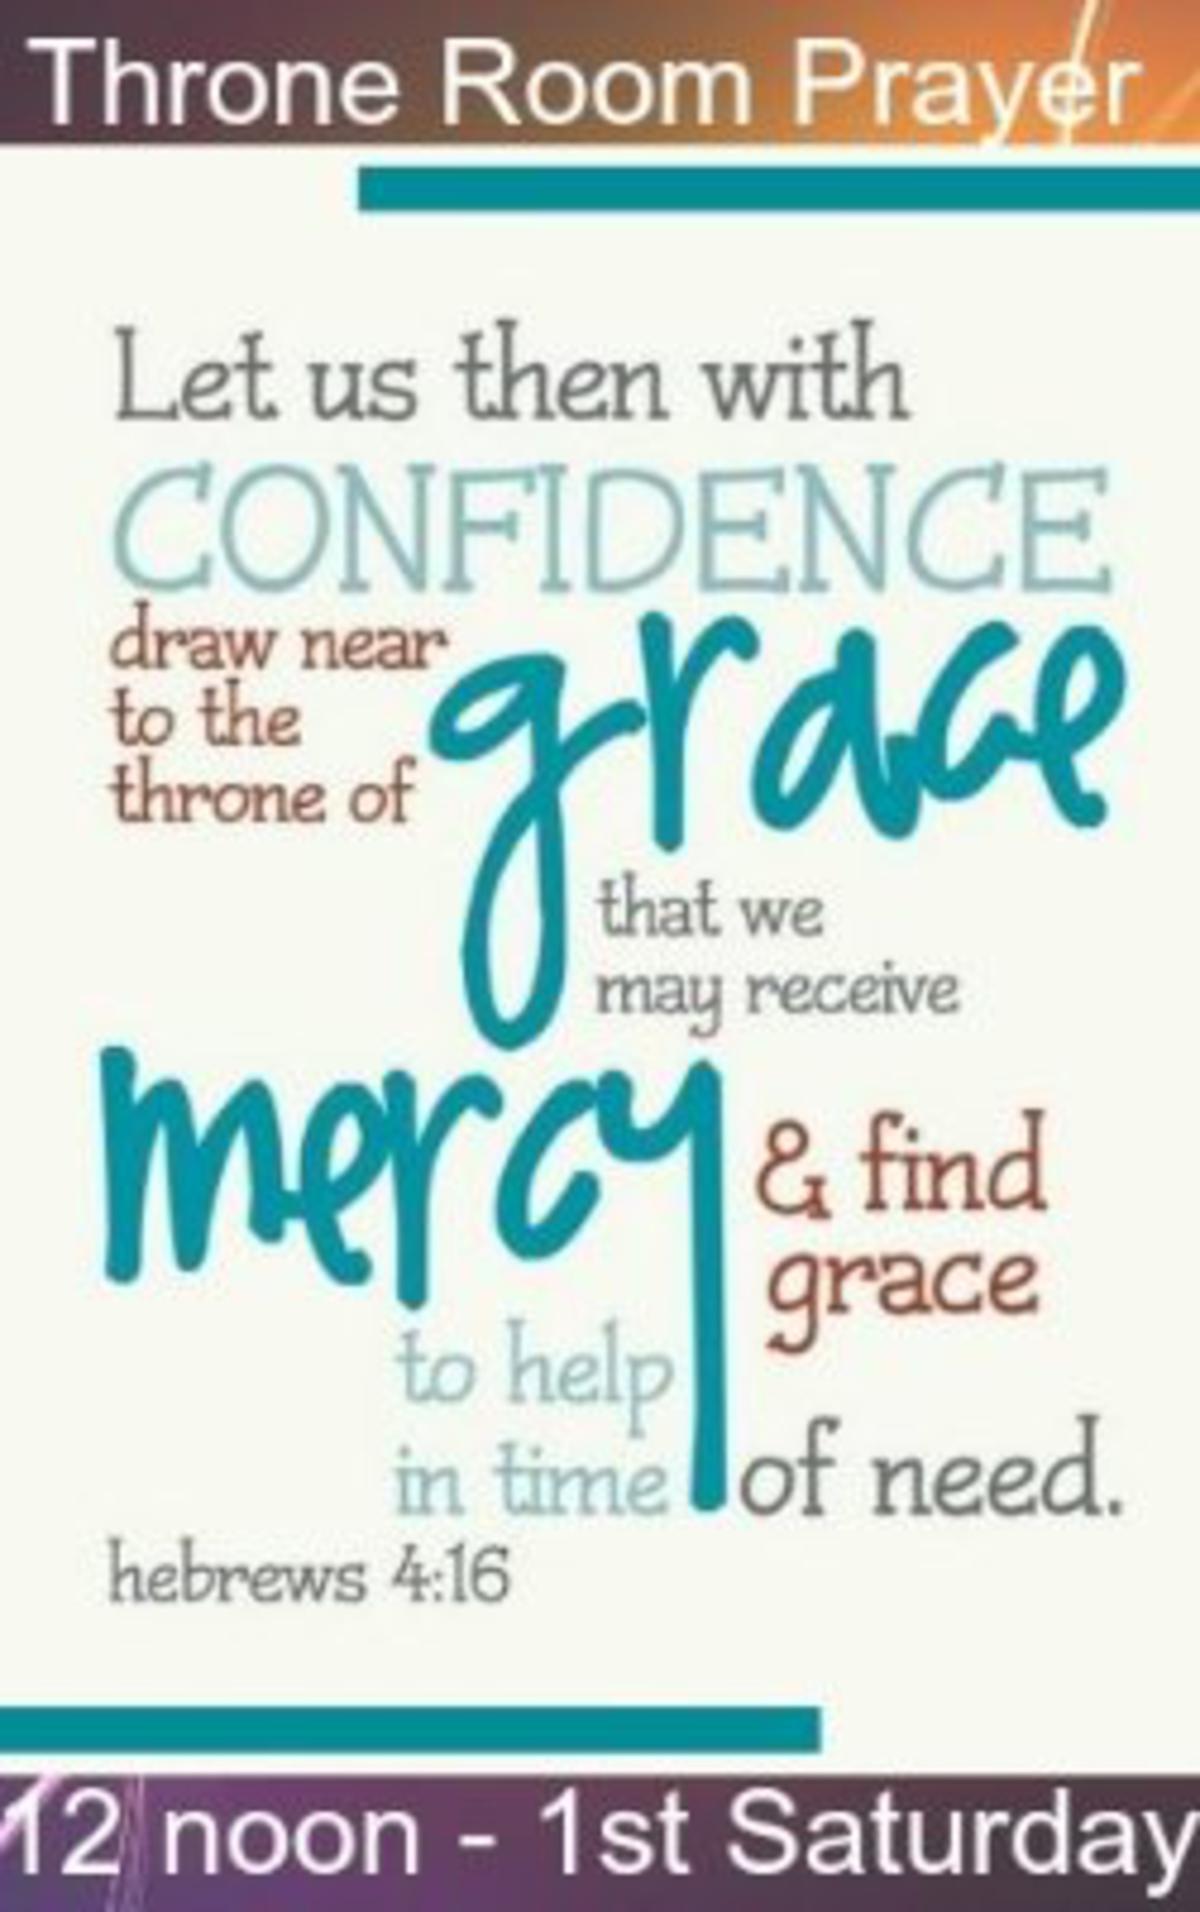 Throne Room Prayer This Saturday!